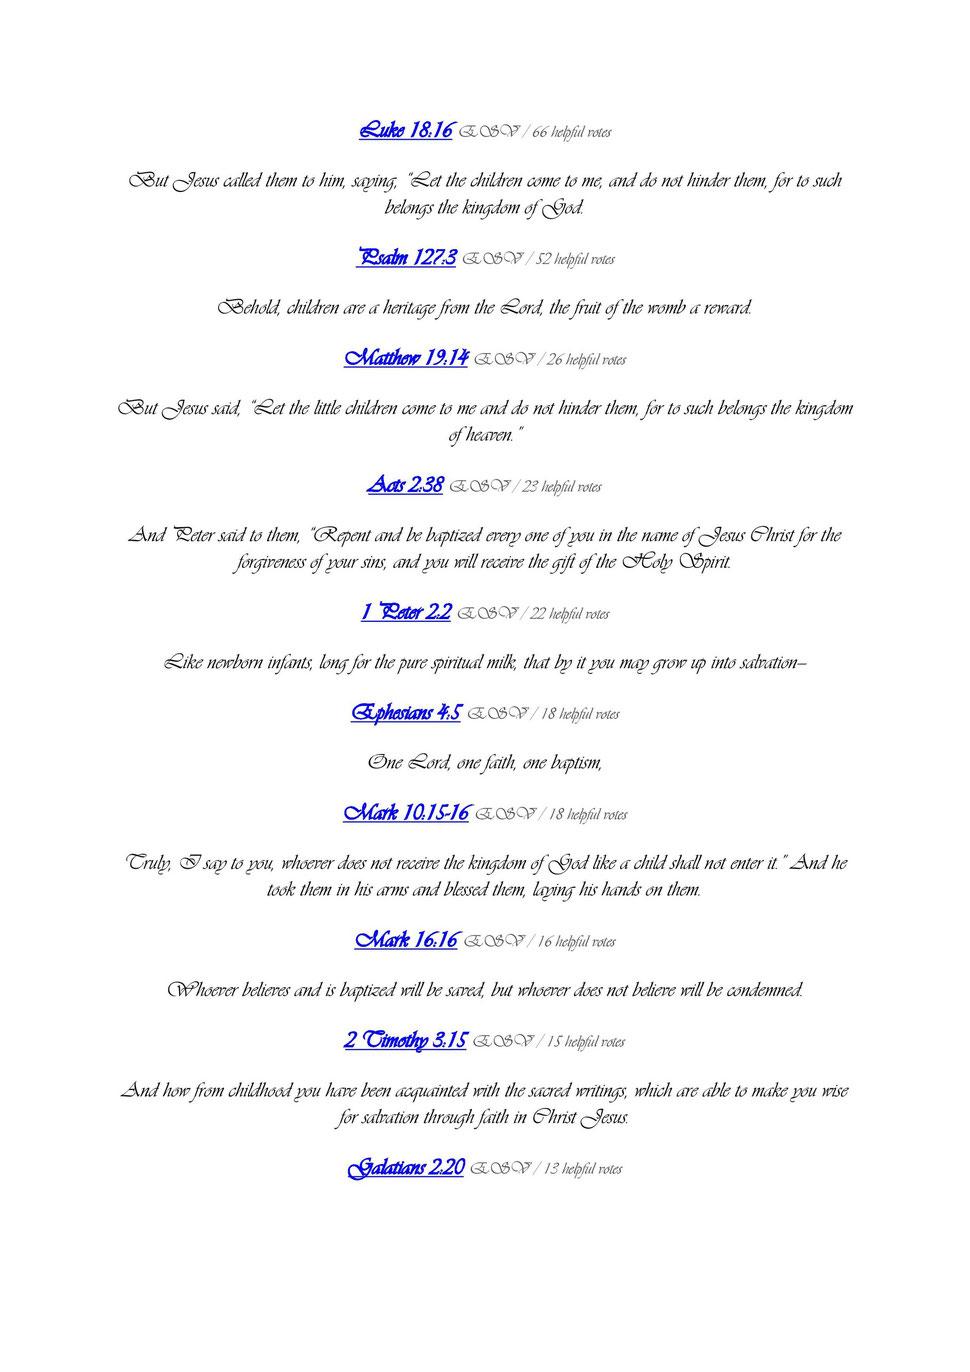 Christening quotes beautyinvites altavistaventures Choice Image